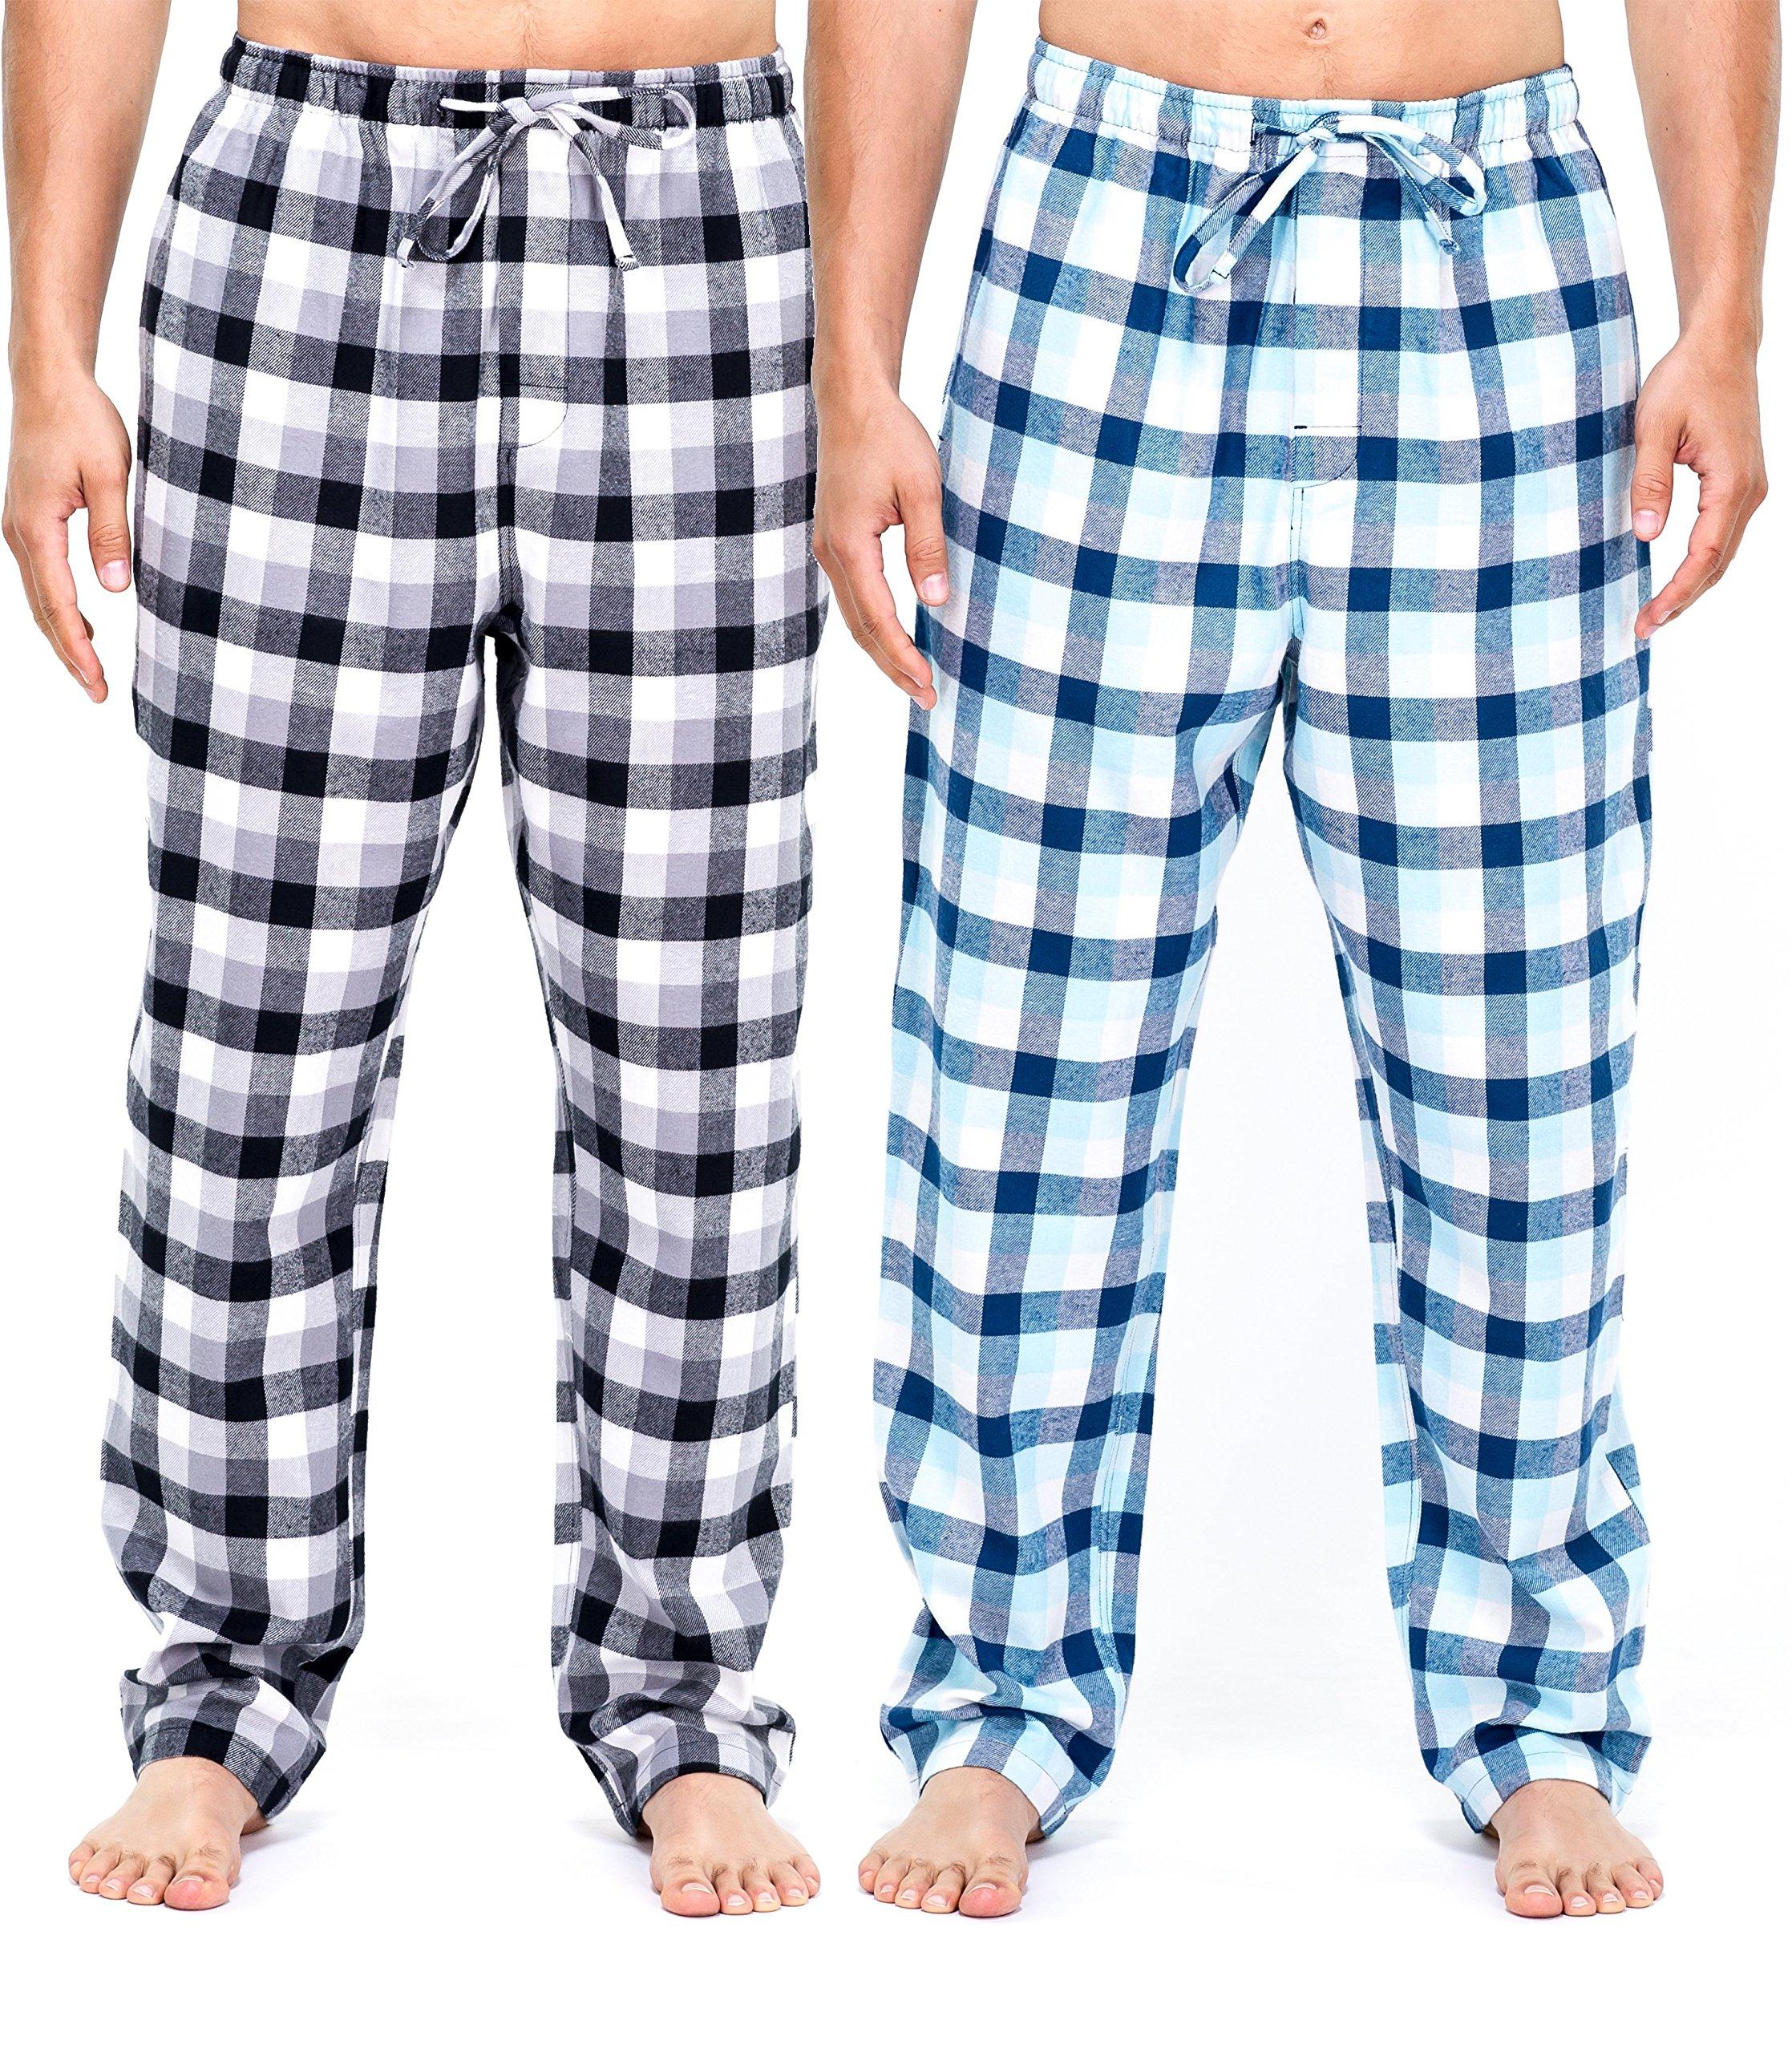 Mens Flannel Pants - 2pk [Black/White - Blue/White Checks Set] - M